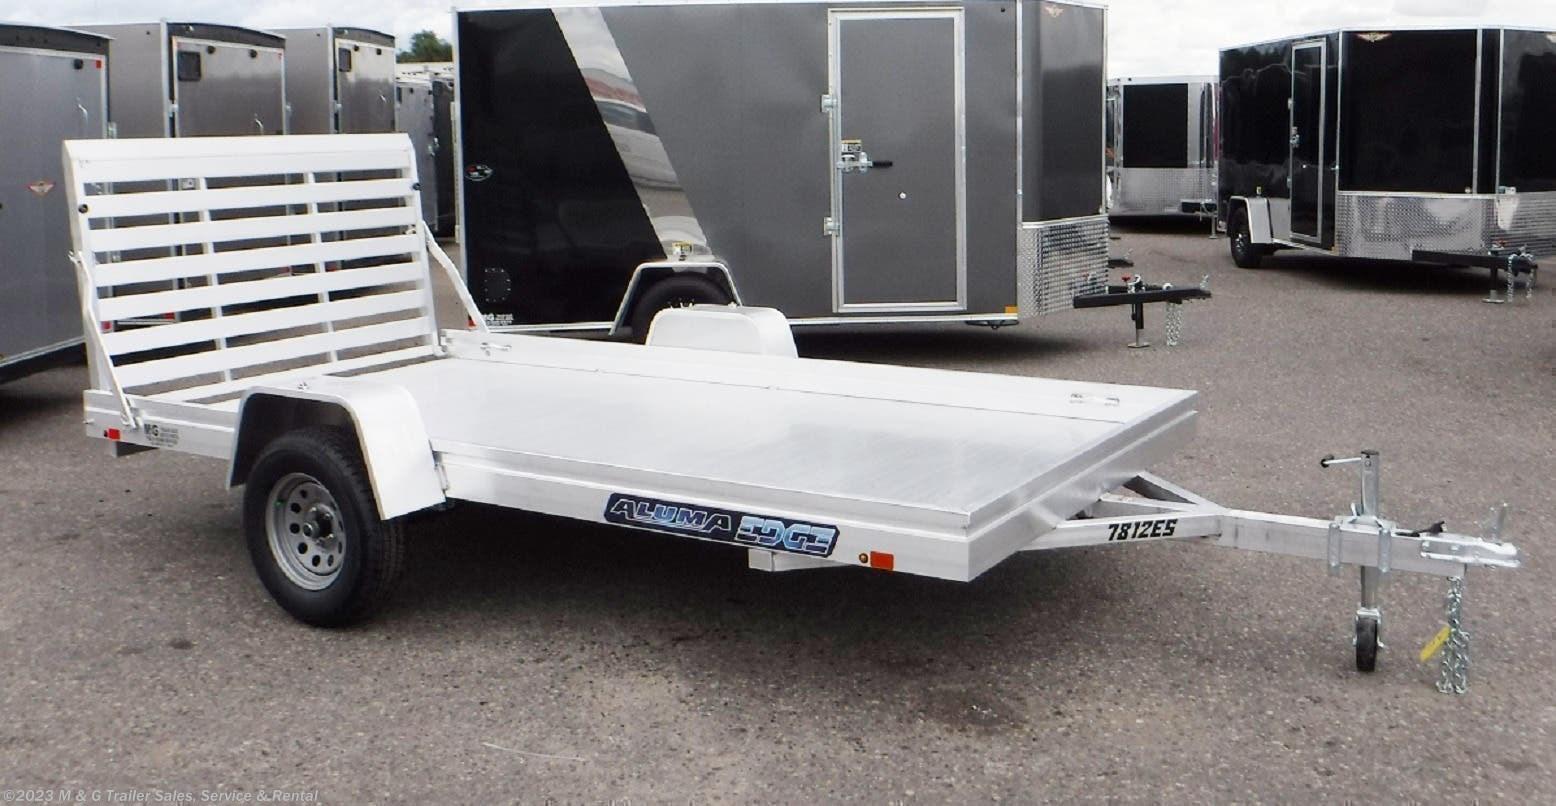 2022 Aluma 7812ES Aluminum Utility Trailer - Stock #242275